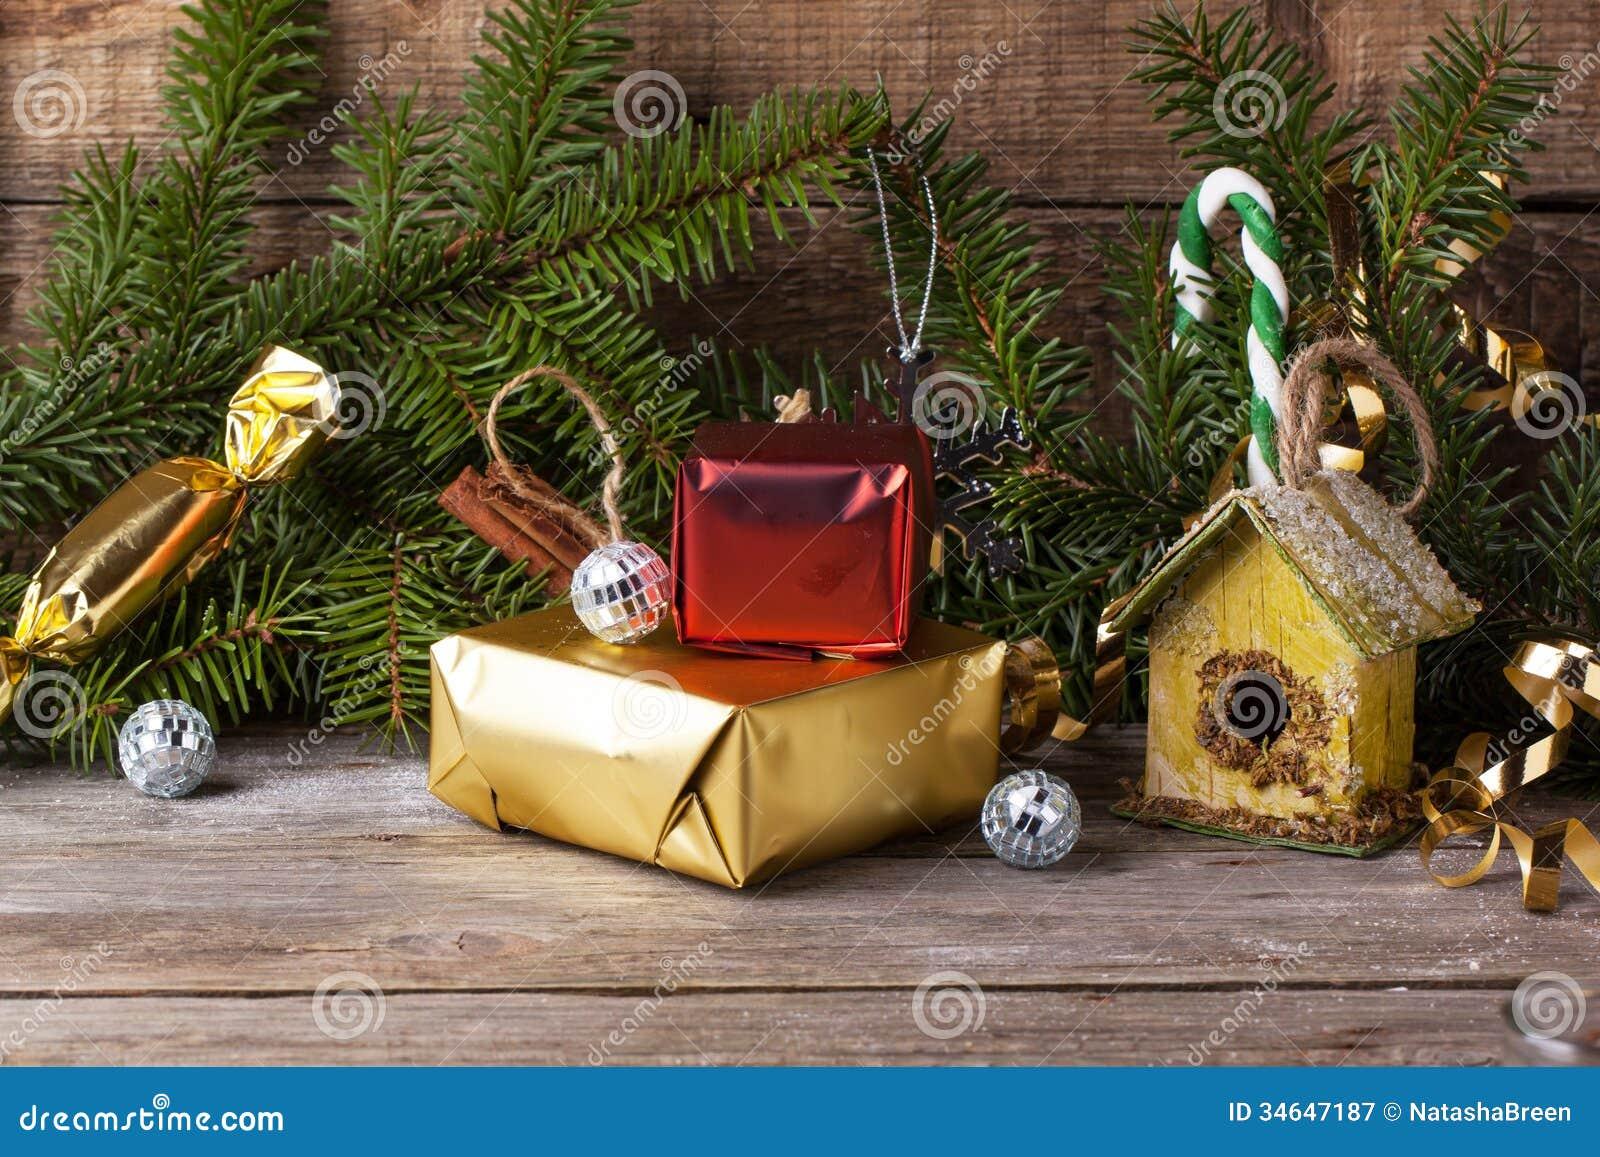 Christmas Decoration With Nesting Box Stock Image - Image of ...